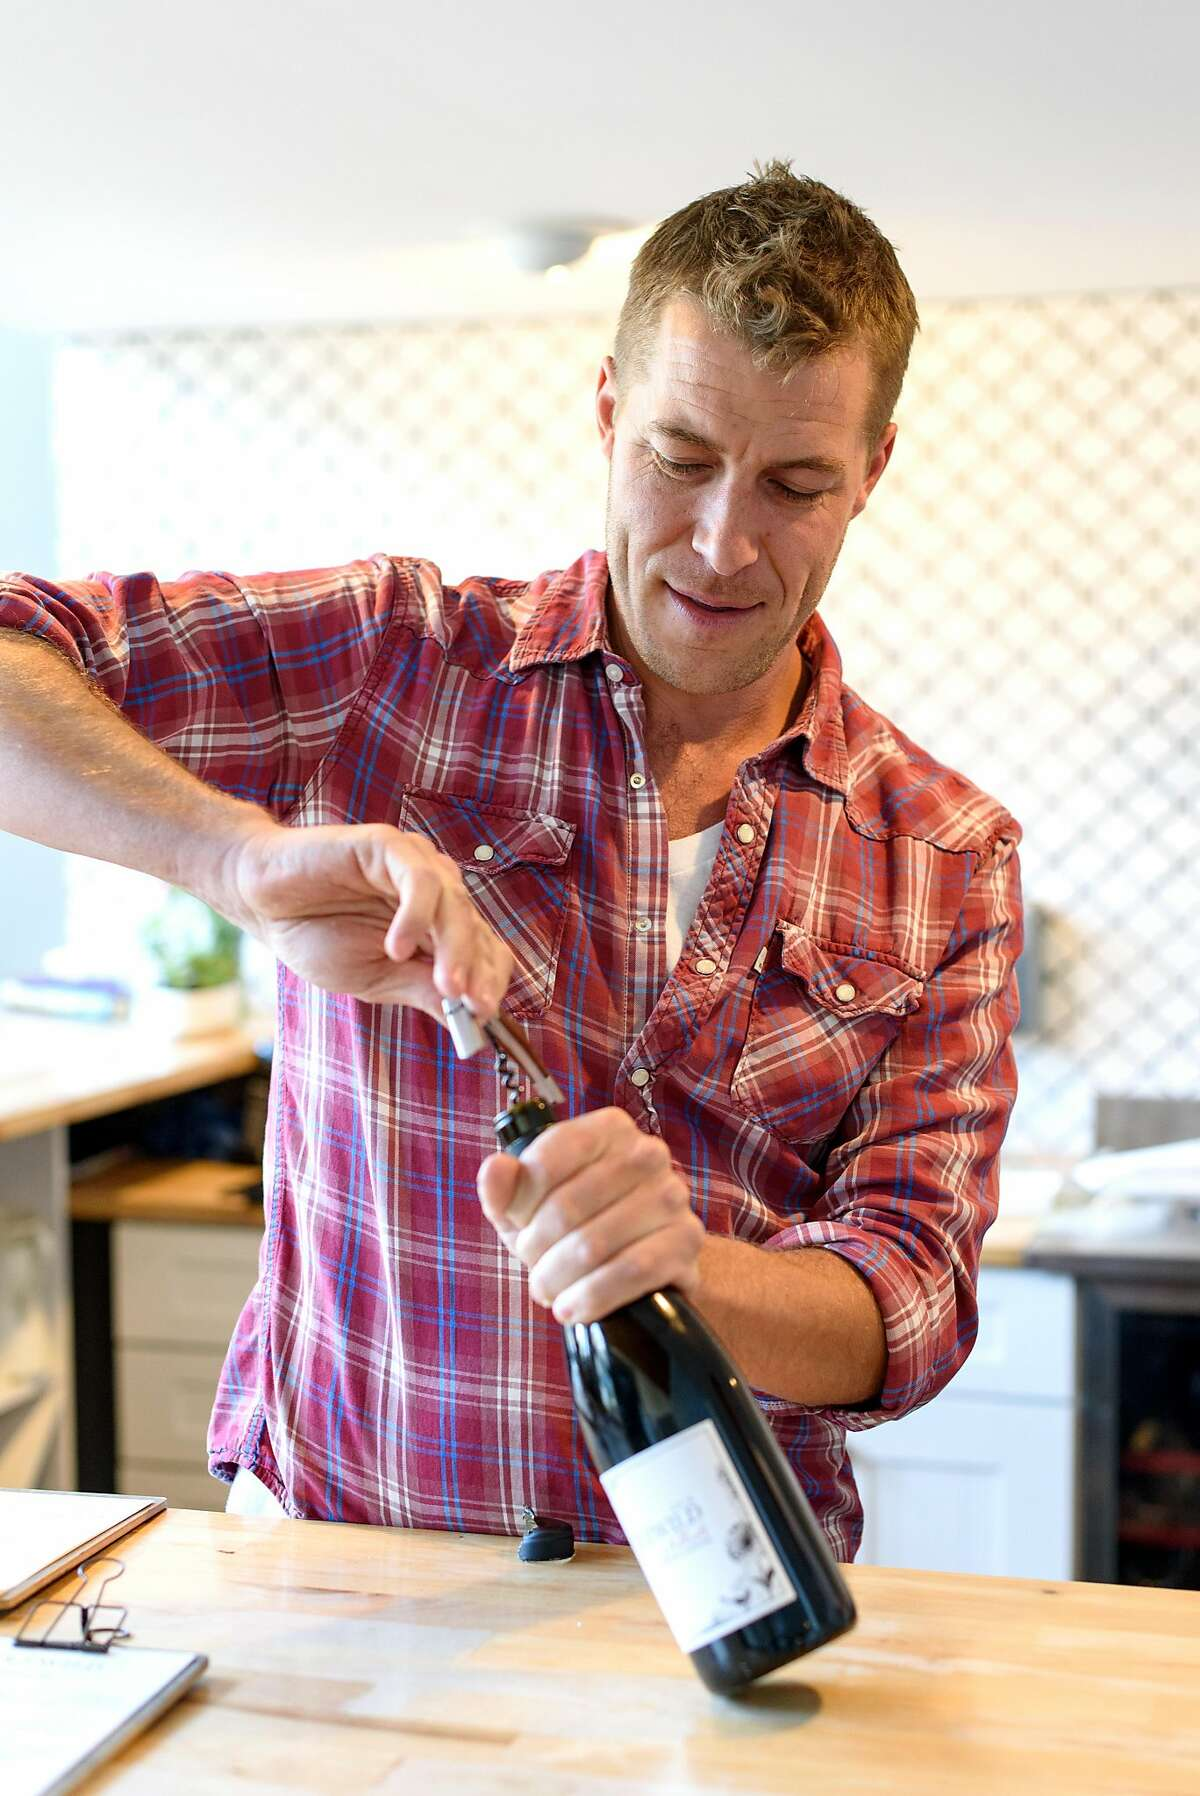 Owner Sam Bilbro opens a bottle of the 2014 Nebbiolo at Idlewild Wines tasting room in Healdsburg, Calif., on Friday June 29, 2018.